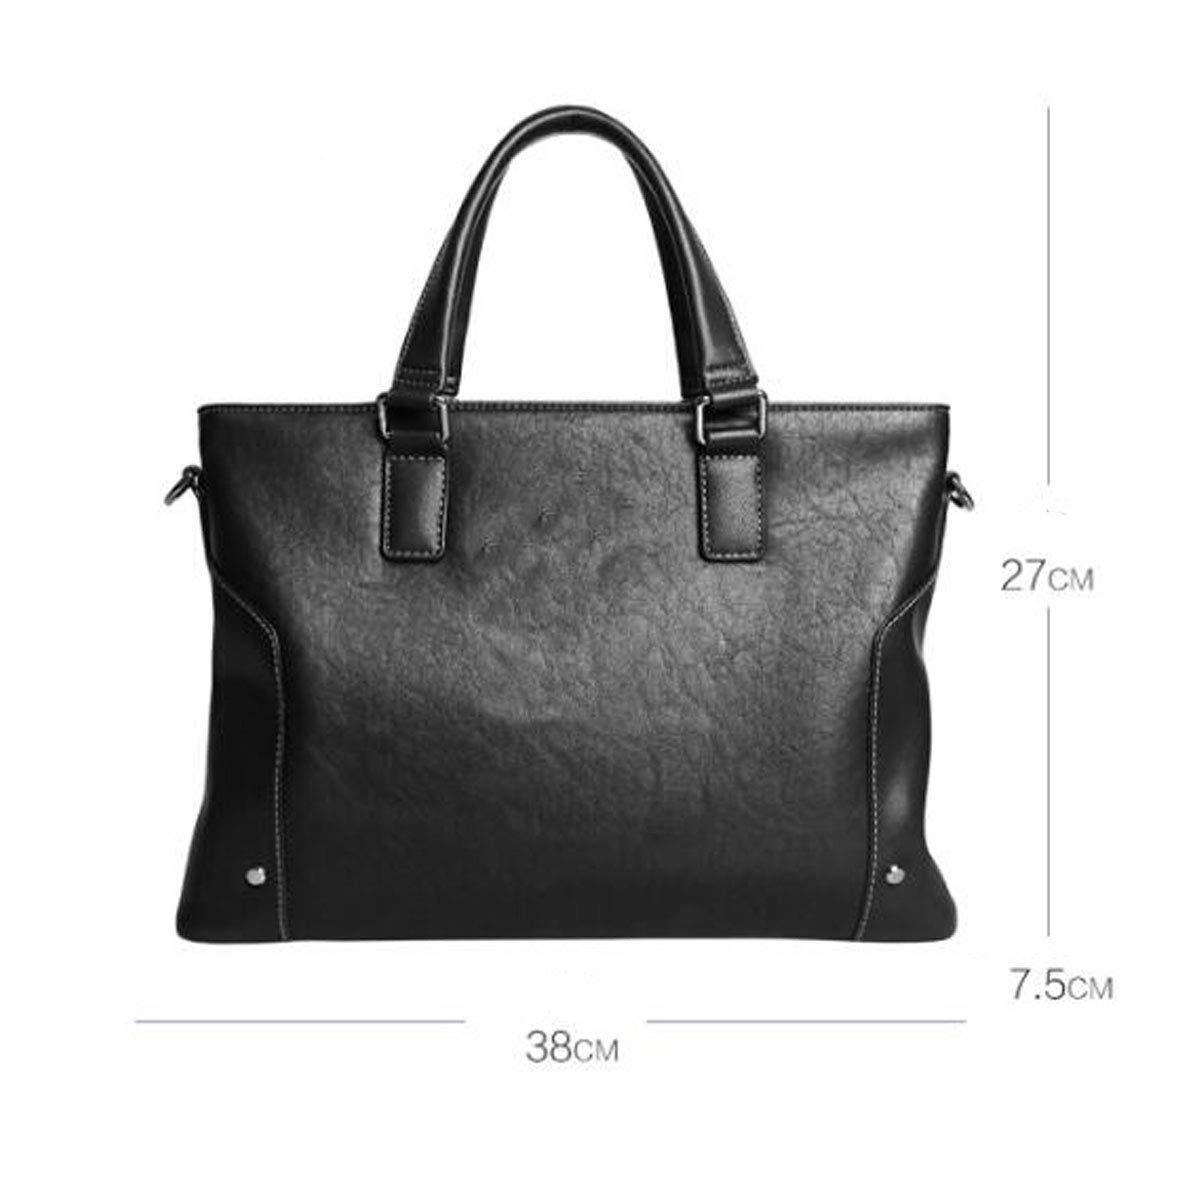 Briefcase 387.527cm Black Size Mens Business Casual Large-capacity Handbag